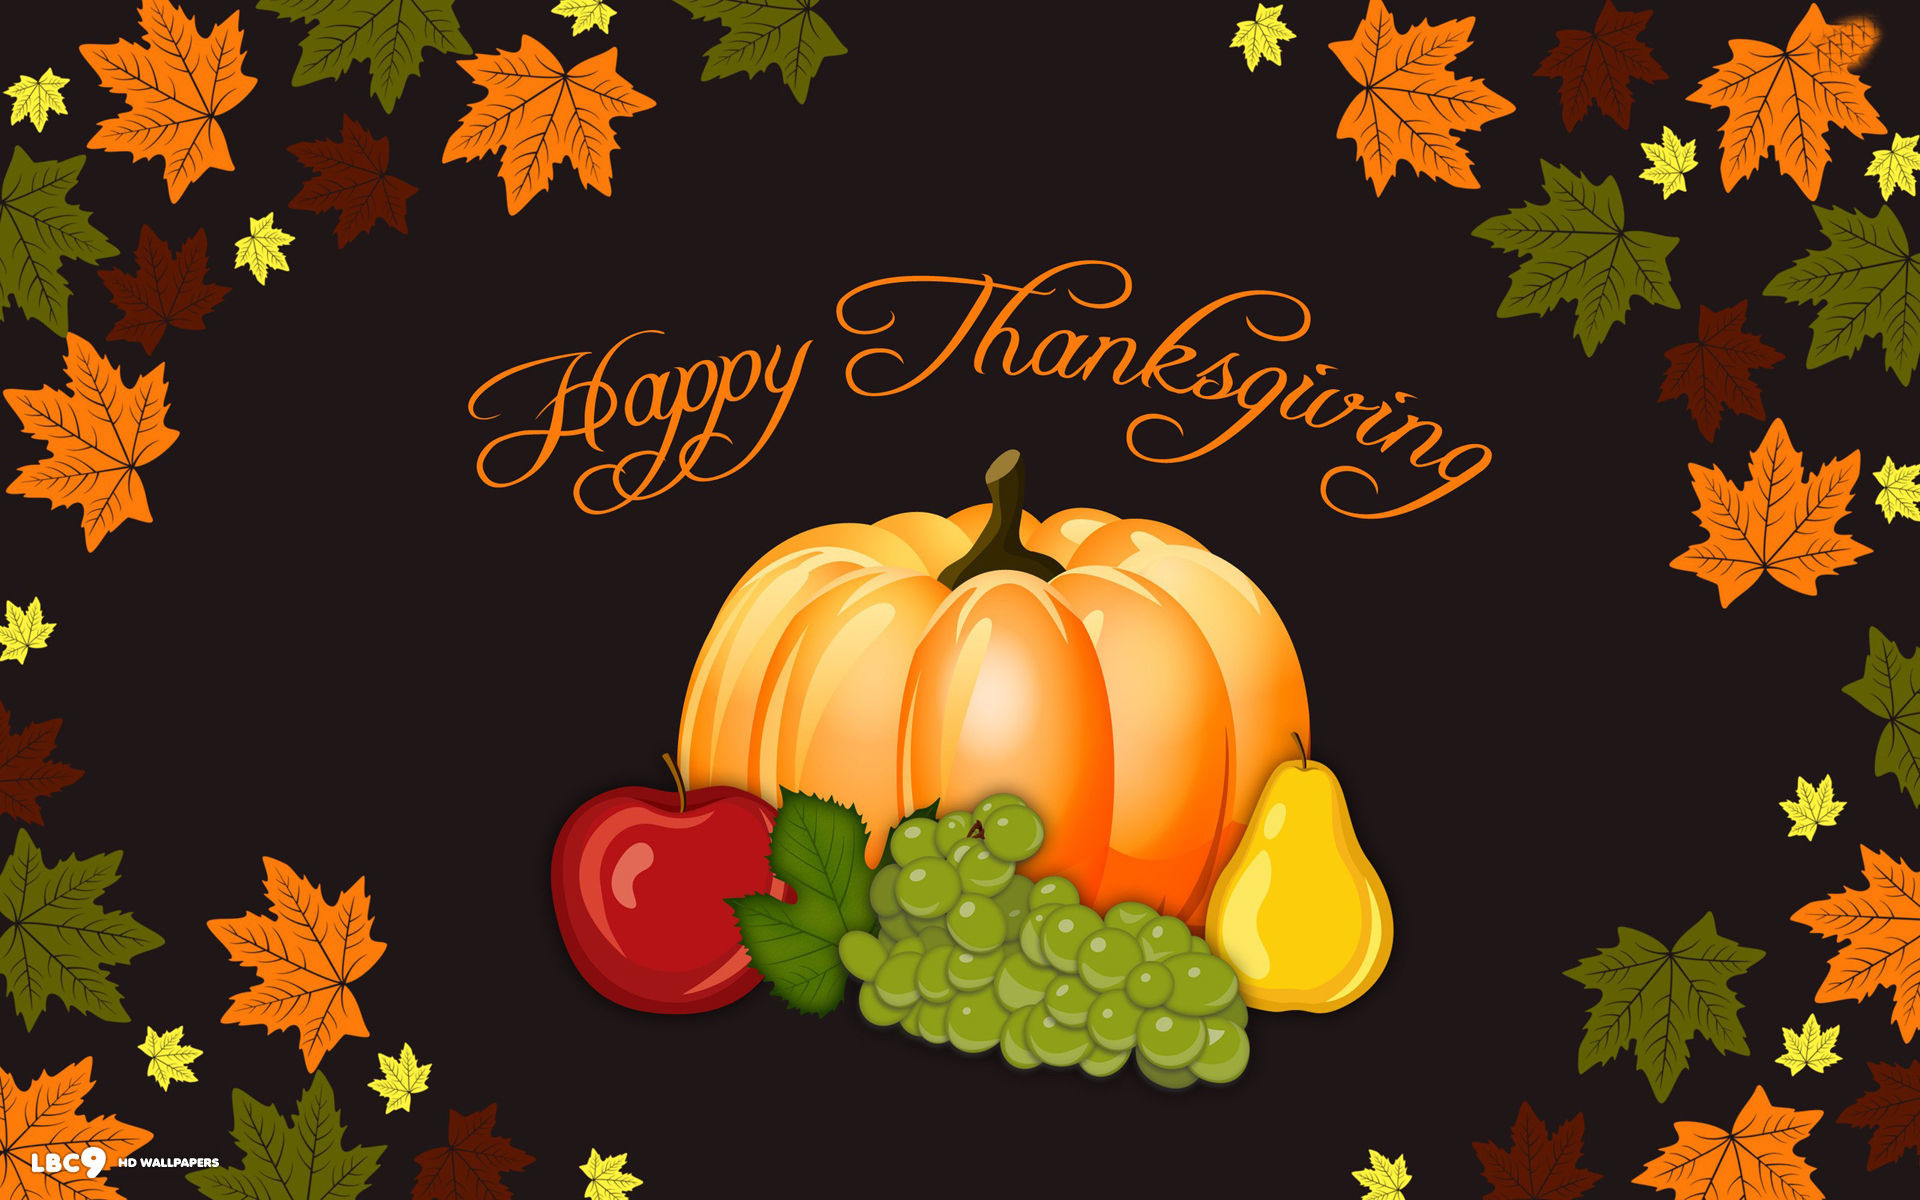 … happy thanksgiving day vector art pumpkin autumn leaves holiday  wallpaper